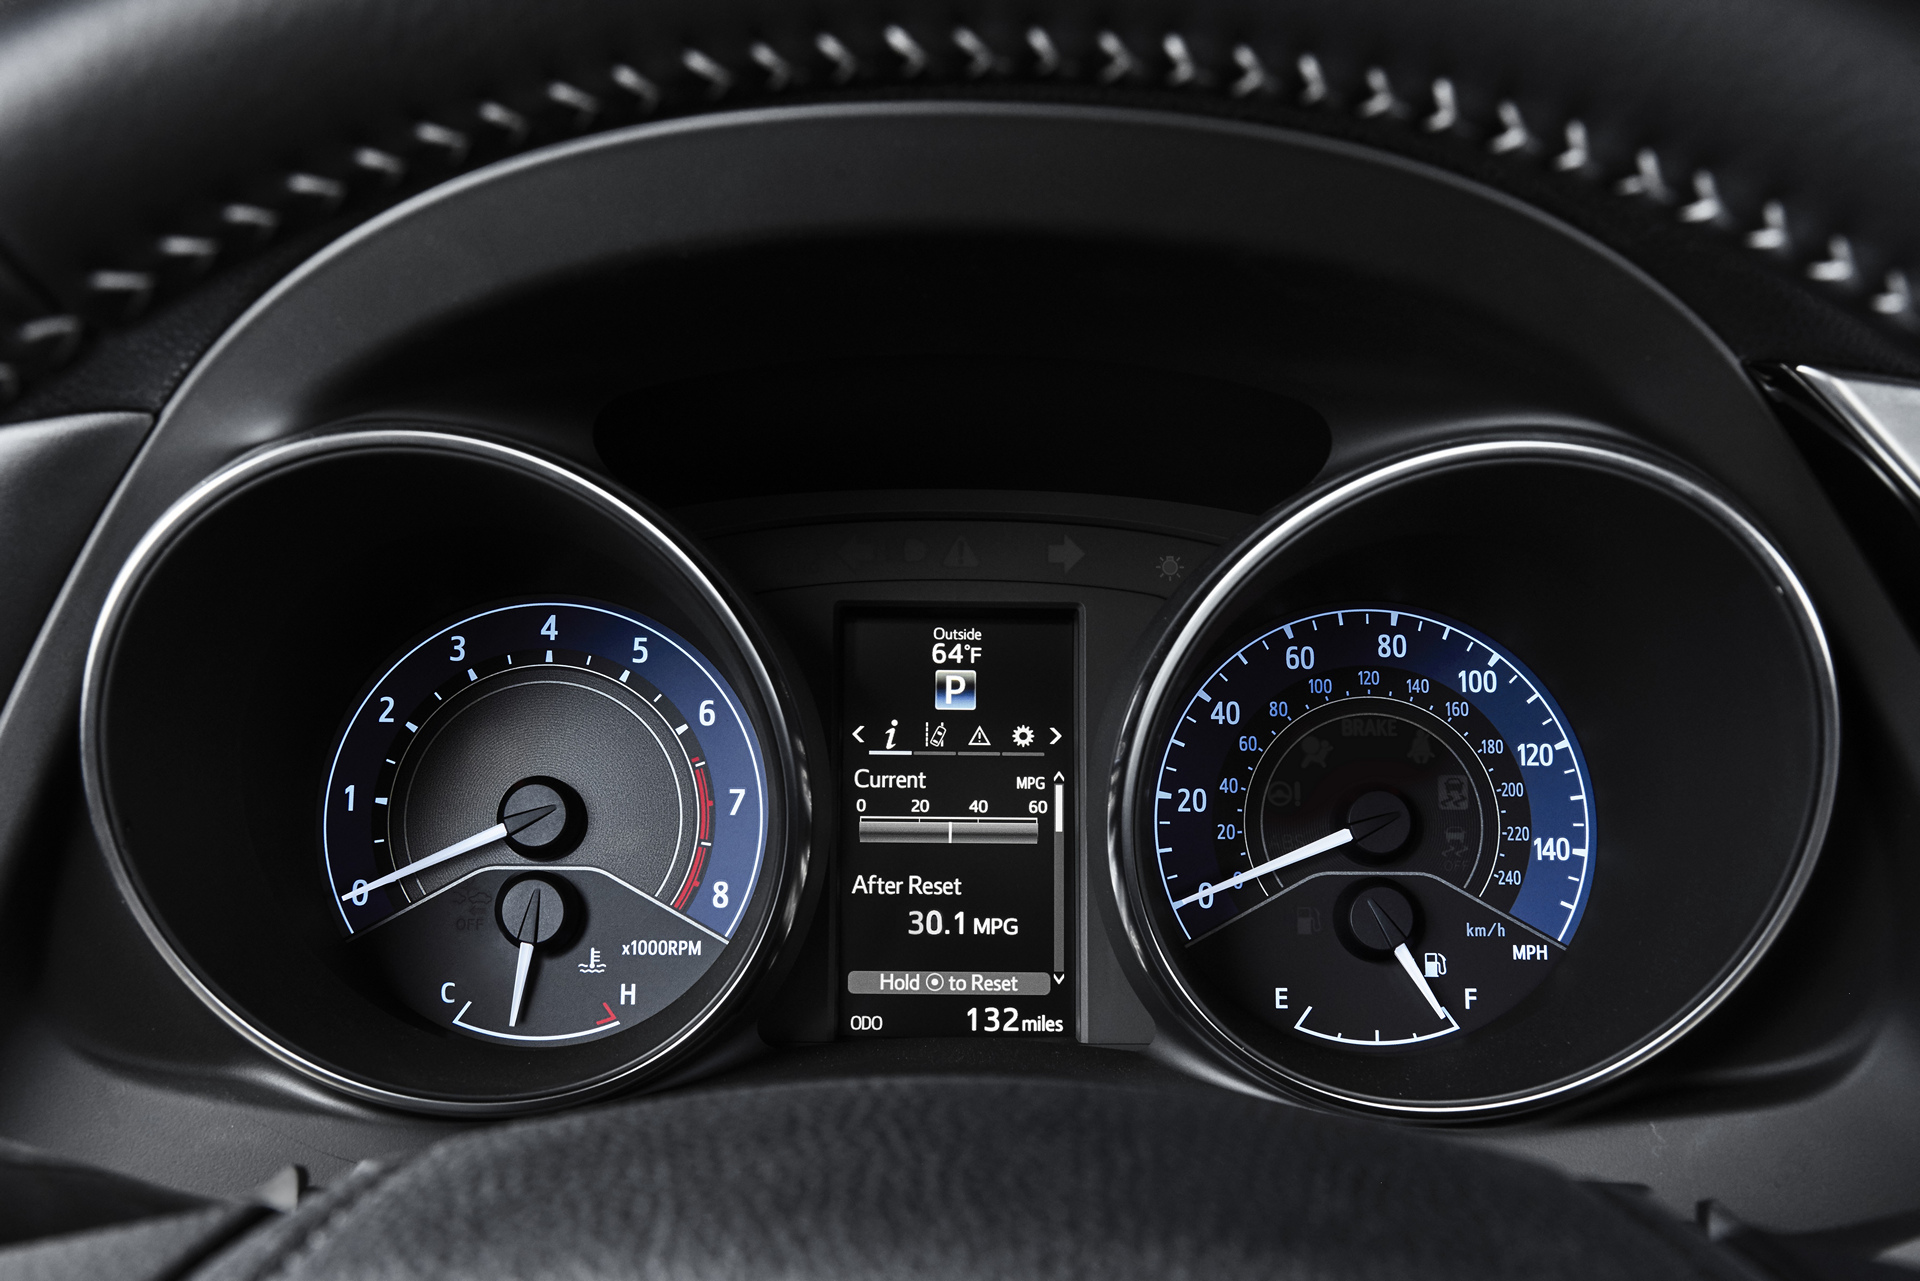 2017 Toyota Corolla iM © Toyota Motor Corporation